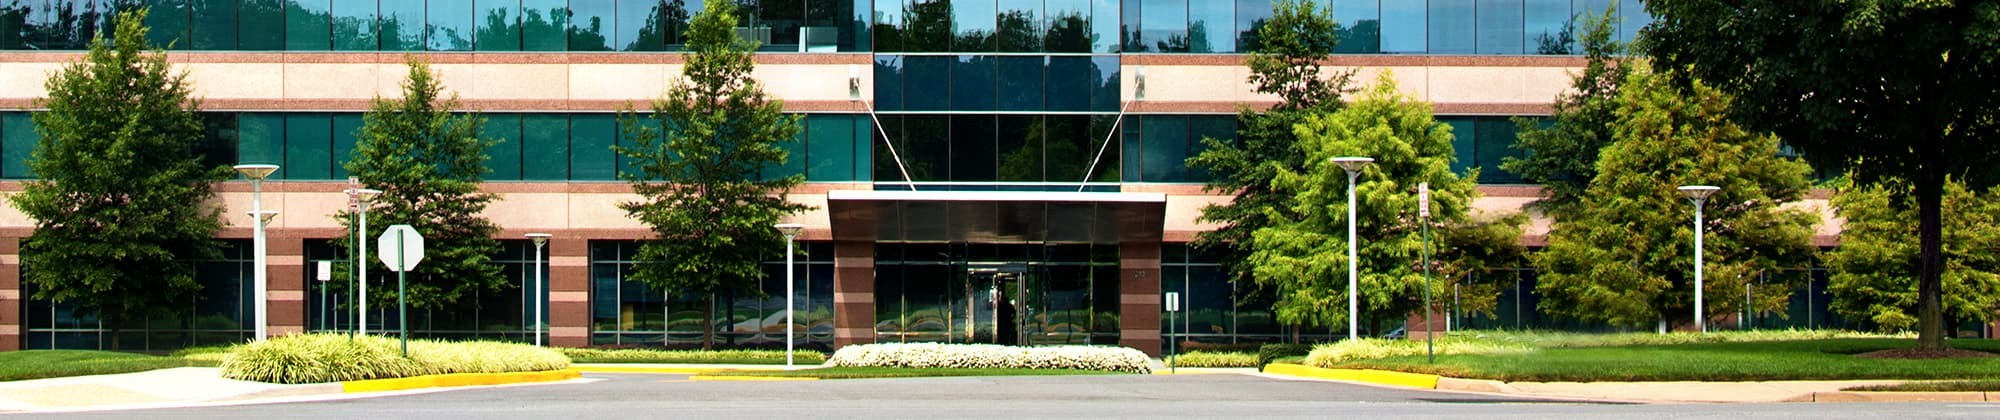 Personal Financial Management Advisors Dallas - Swearingen